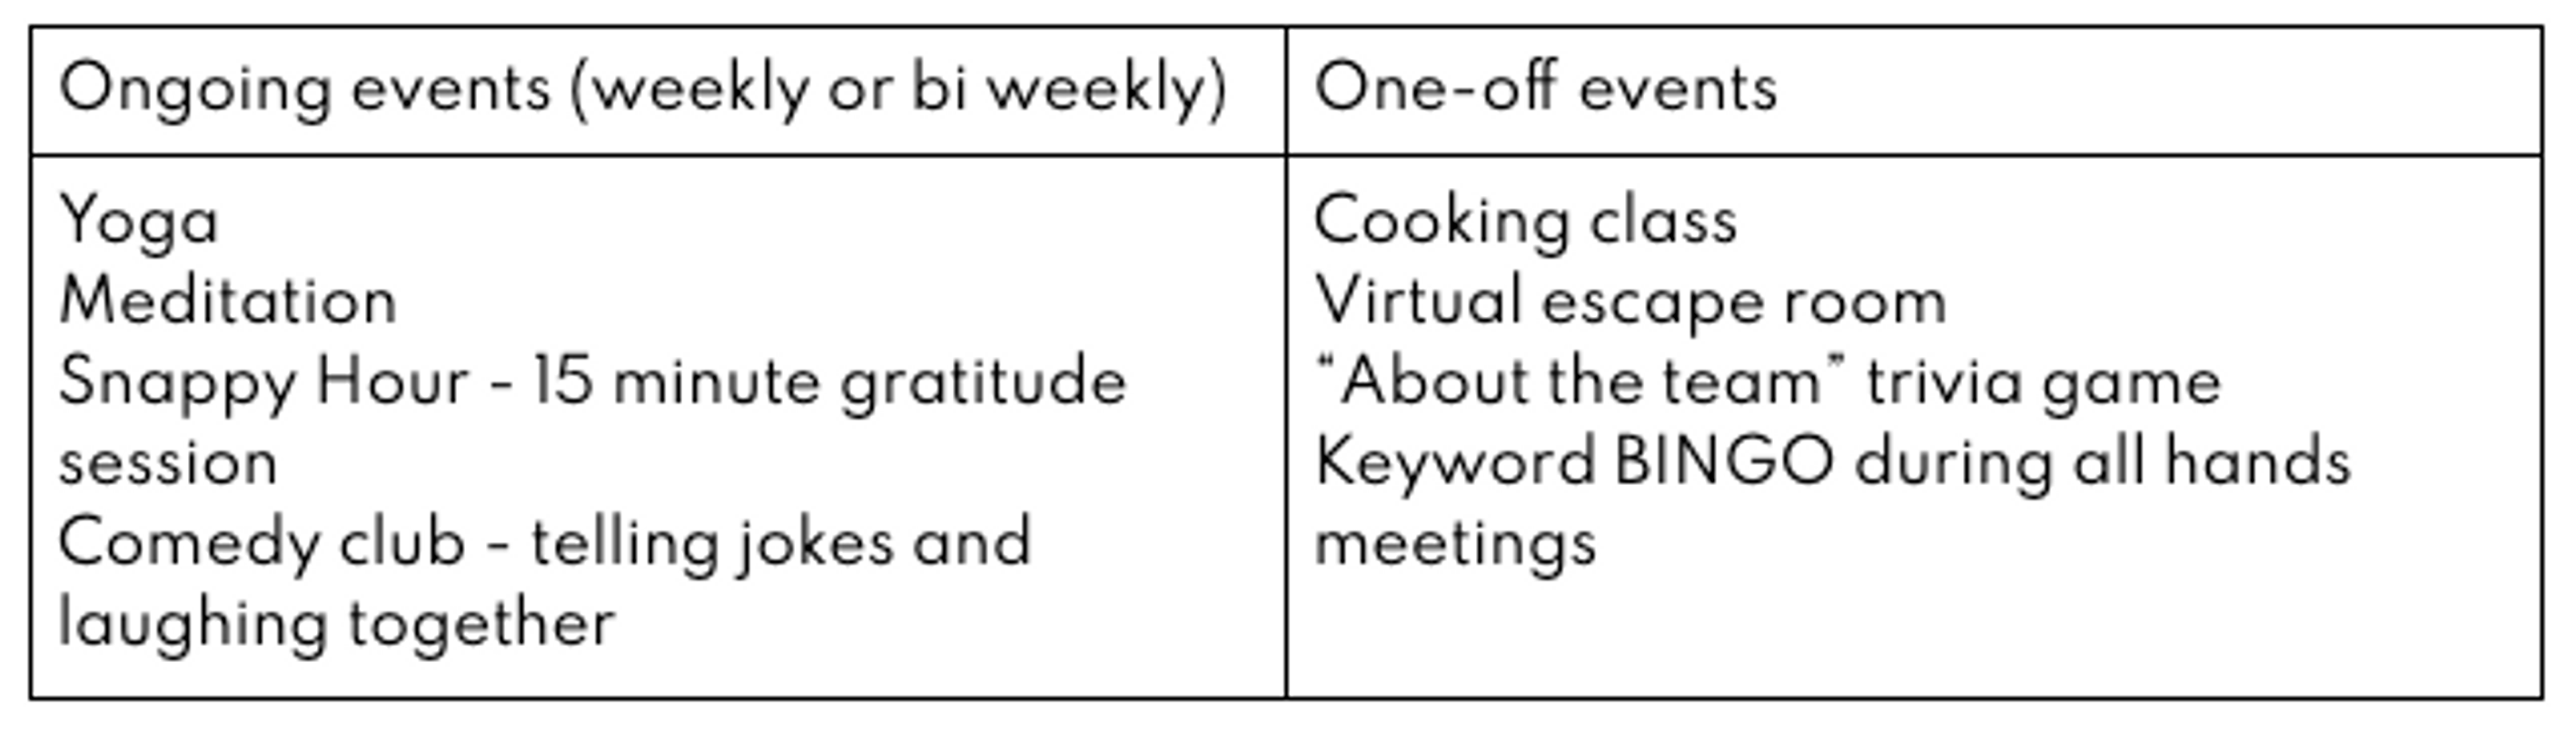 Event descriptions